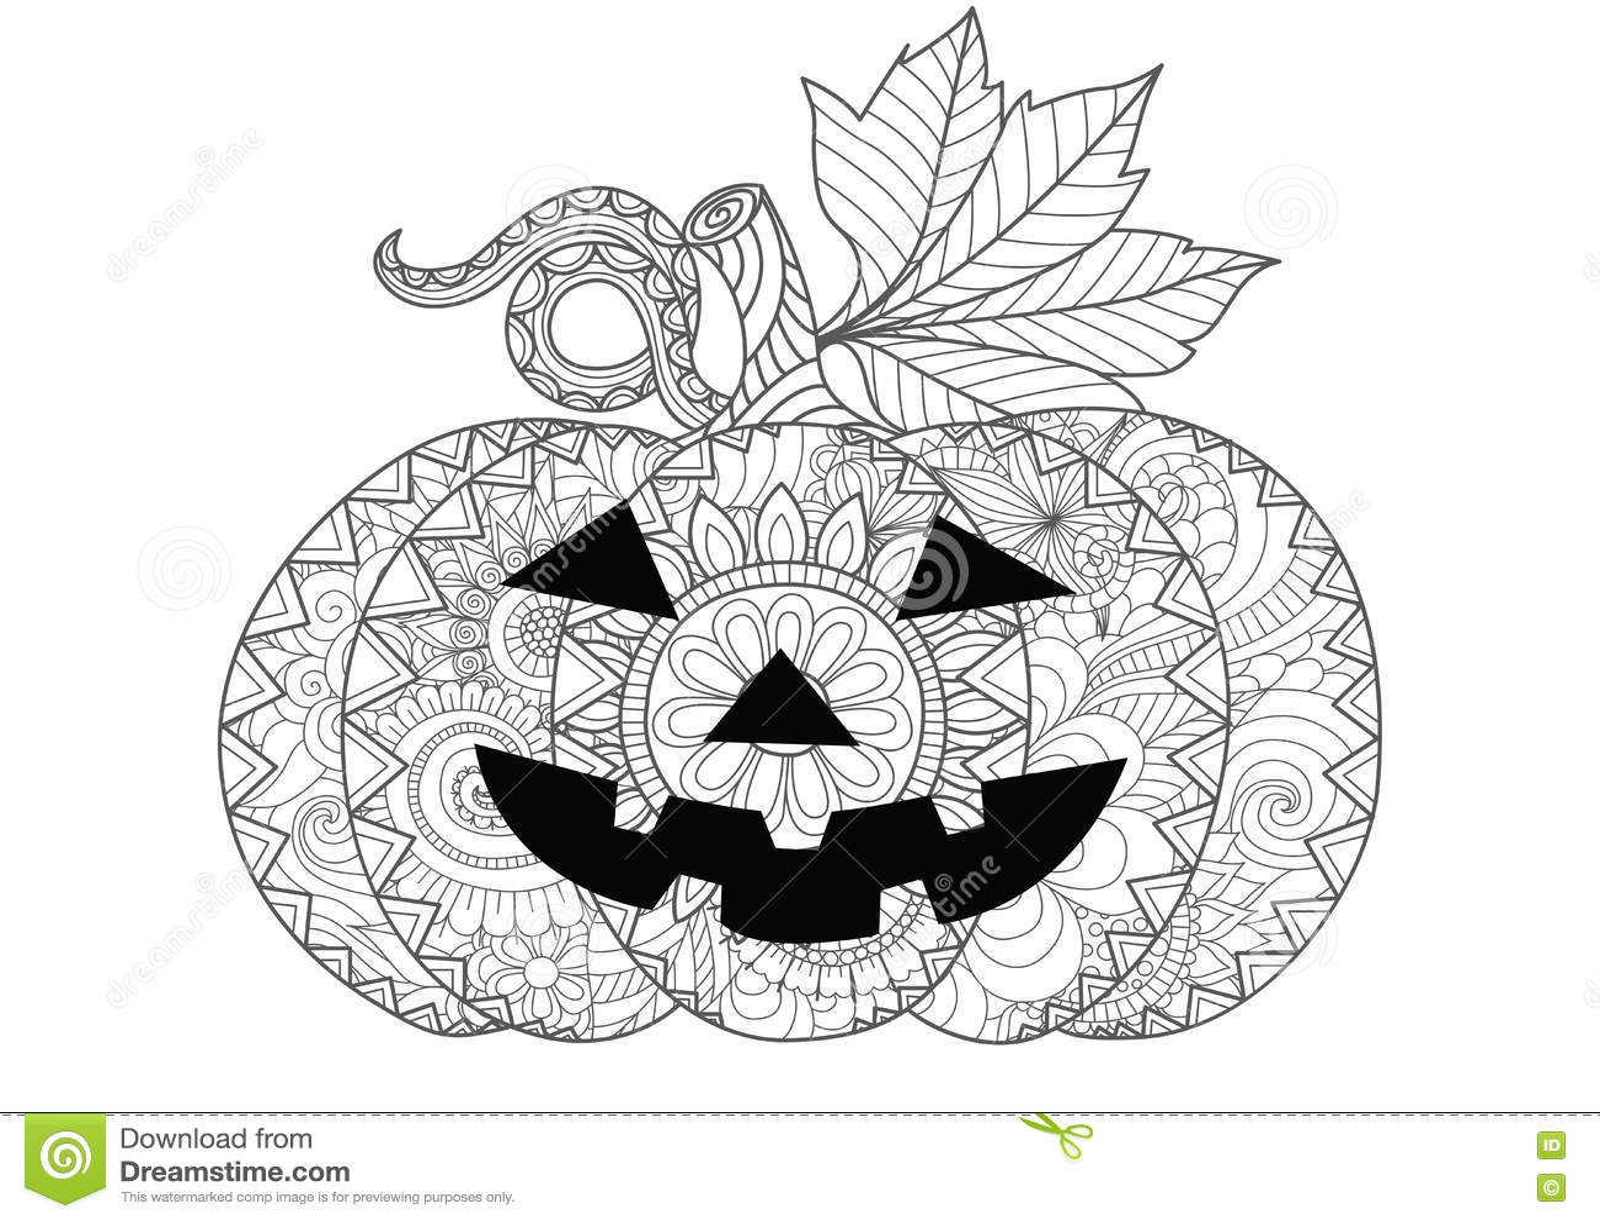 Doodle Design Of Halloween Pumpkin For Halloween Card Invitations ...